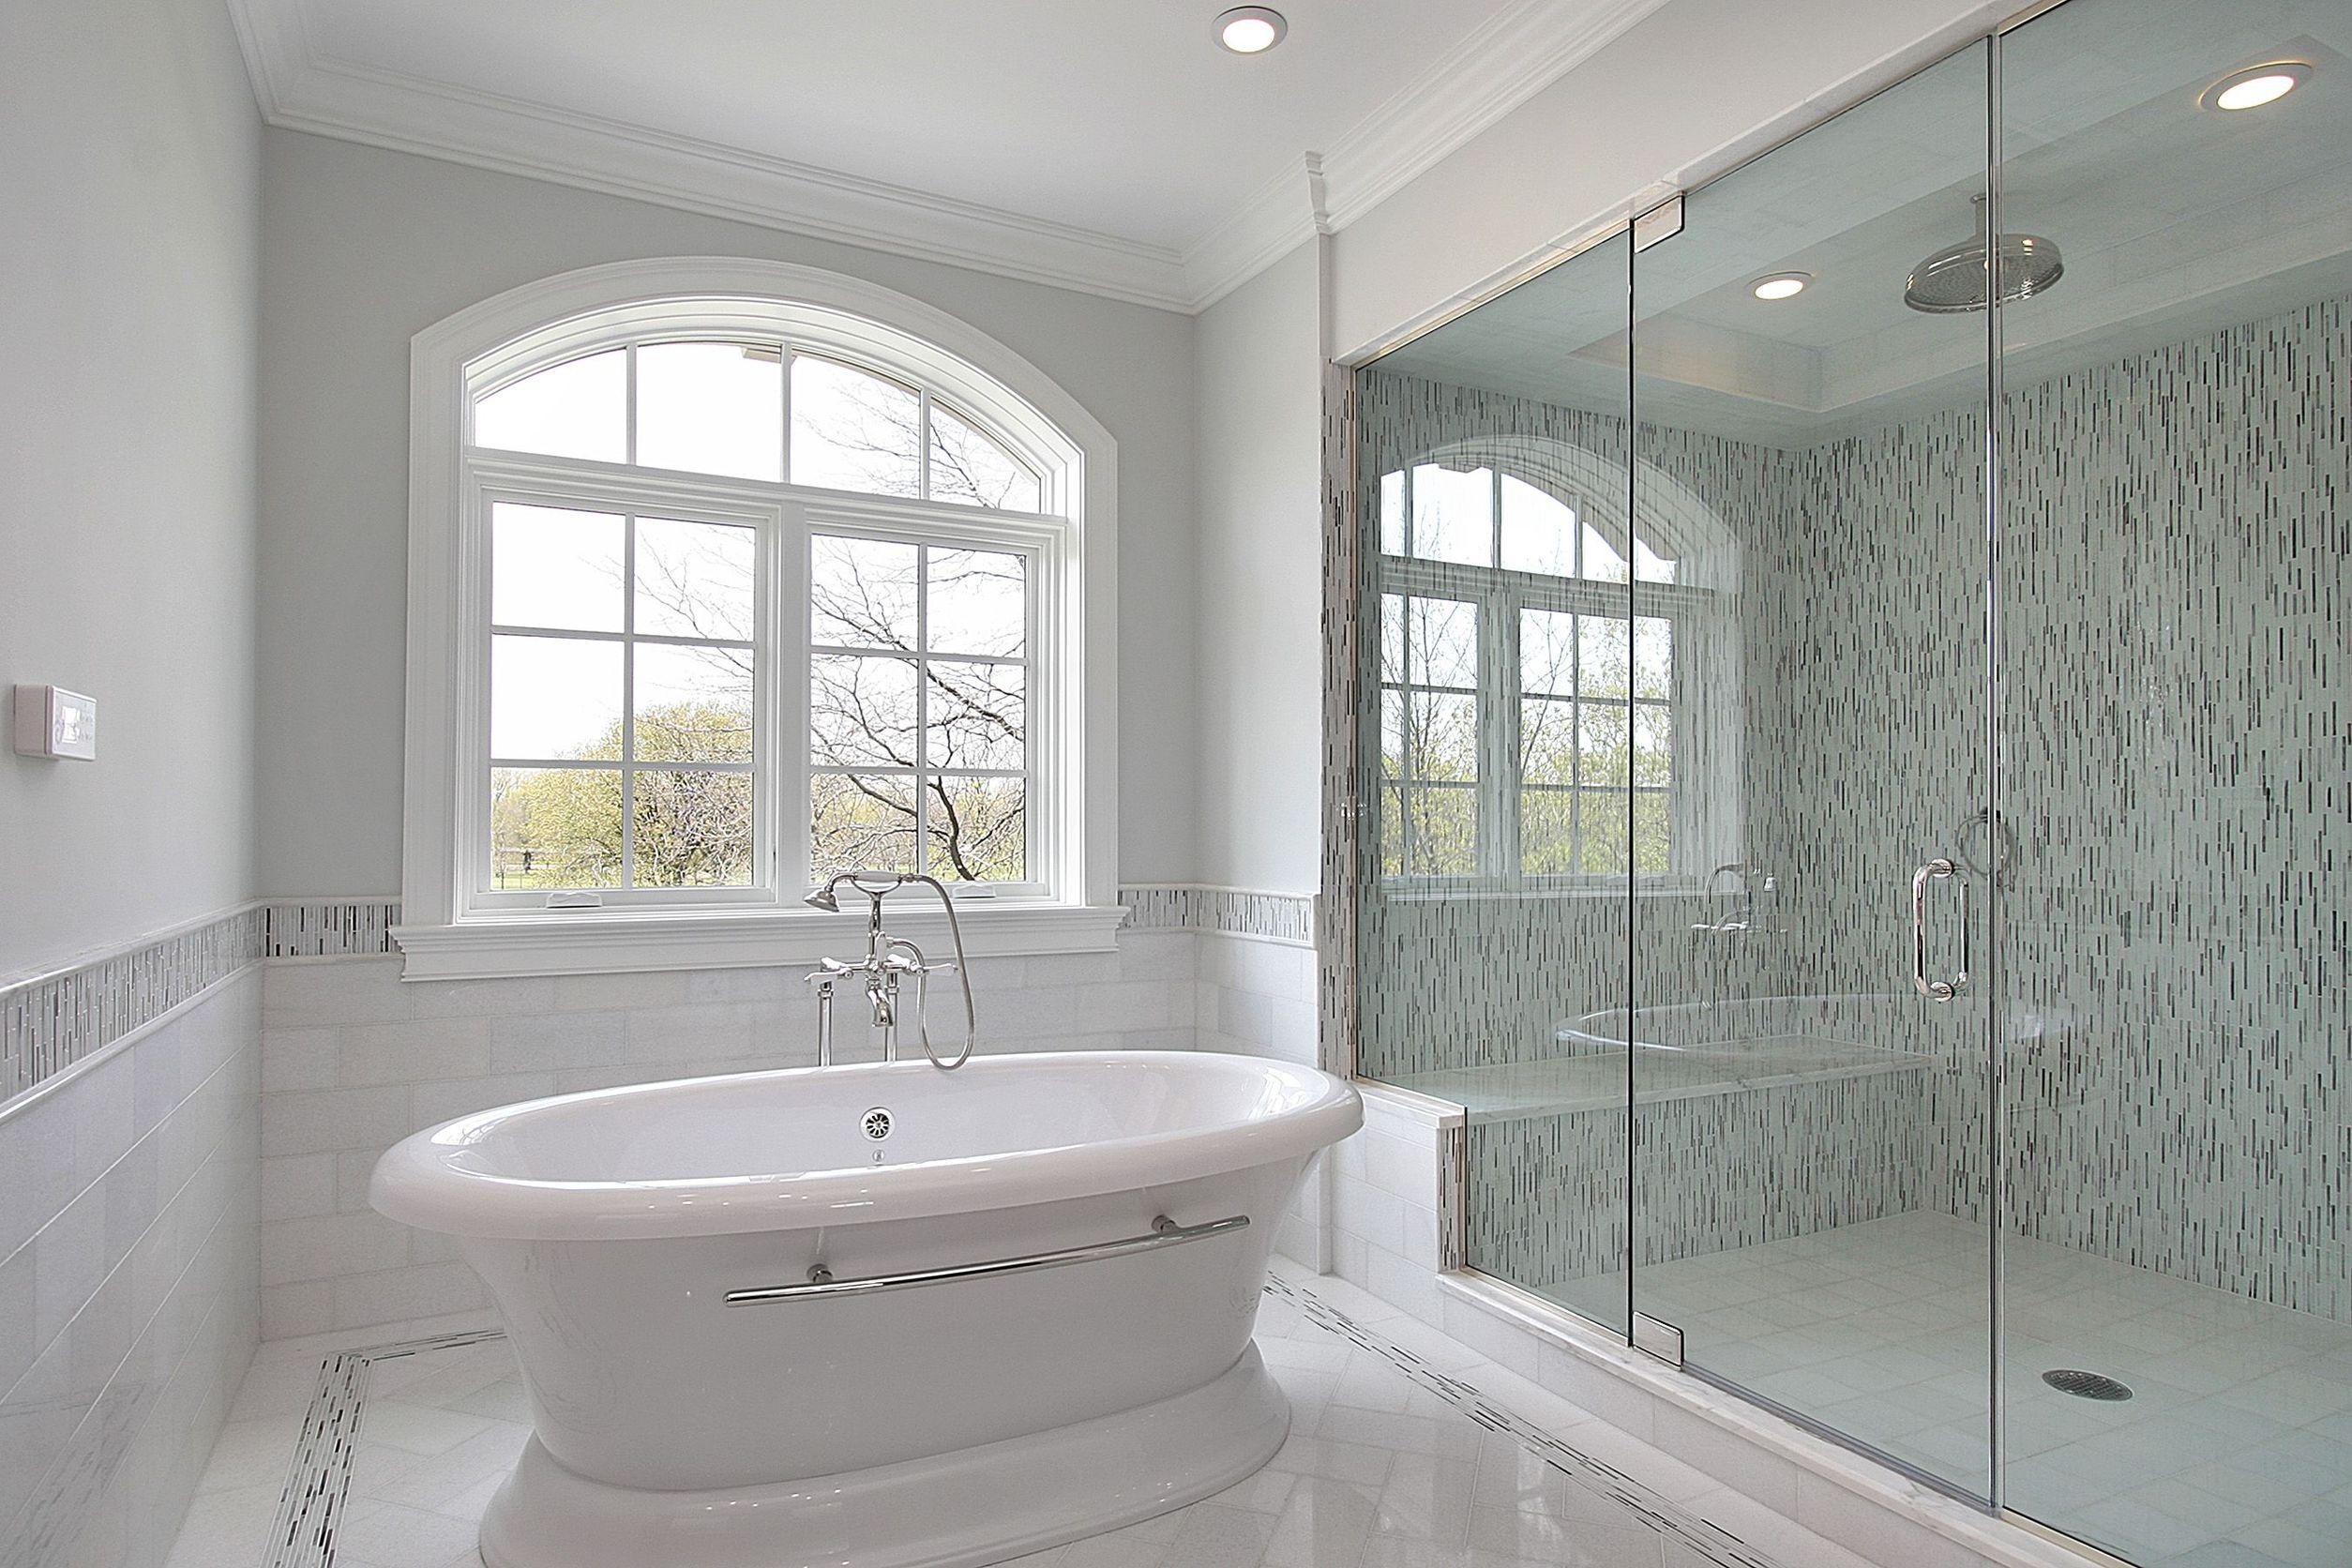 Bathroom Renovation Canadian Insulation Inc - Bathroom renovations for seniors